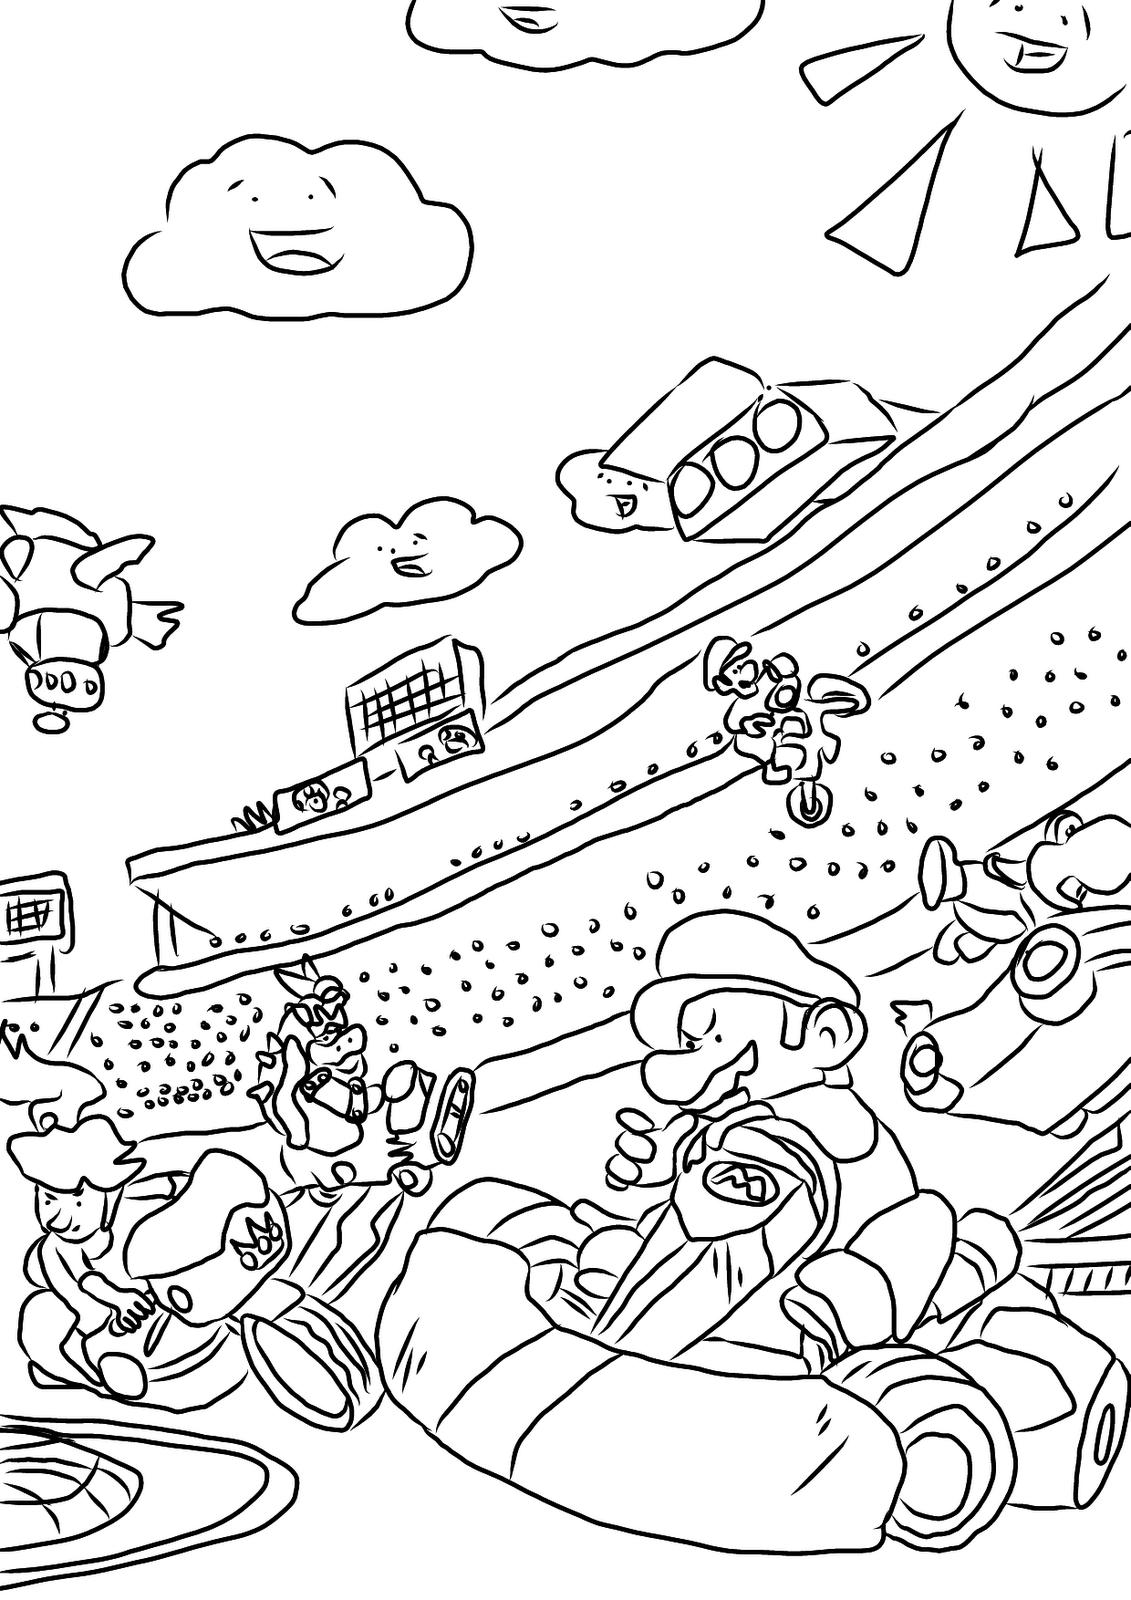 mario kart coloring mario kart coloring pages best coloring pages for kids kart coloring mario